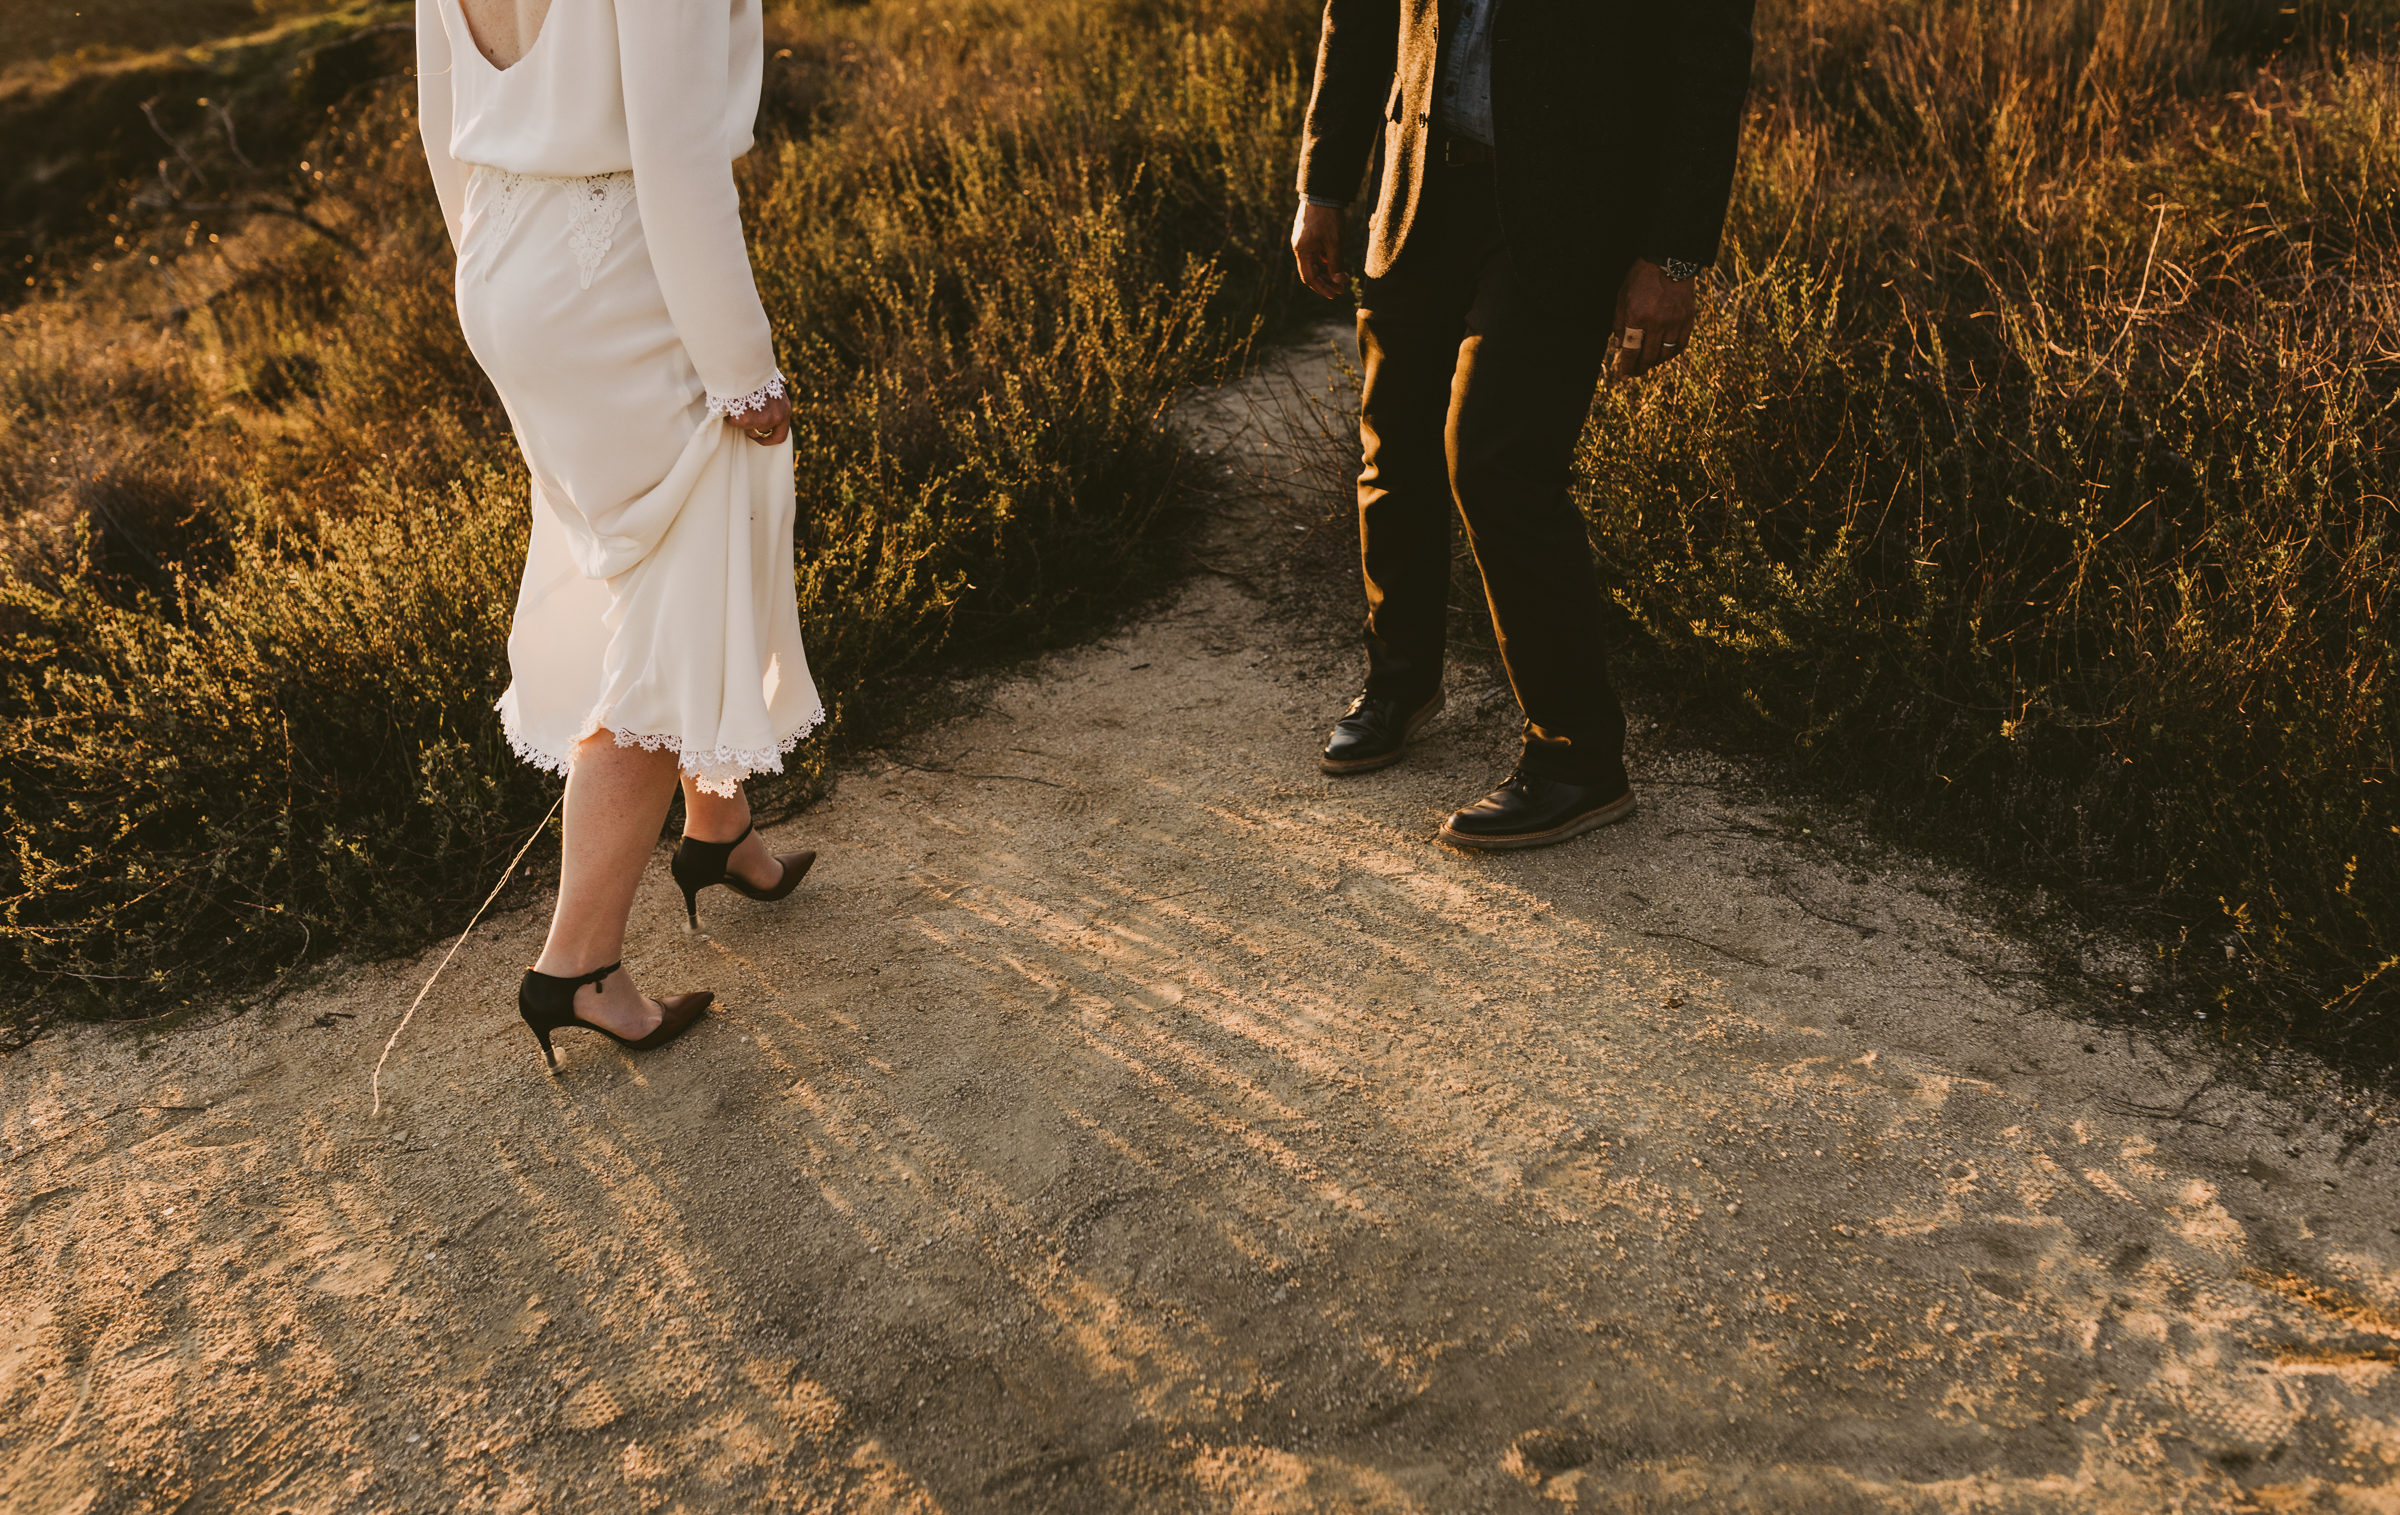 ©Isaiah + Taylor Photography - Intimate Elopement, Eaton Canyon, Los Angeles Wedding Photographer-84.jpg